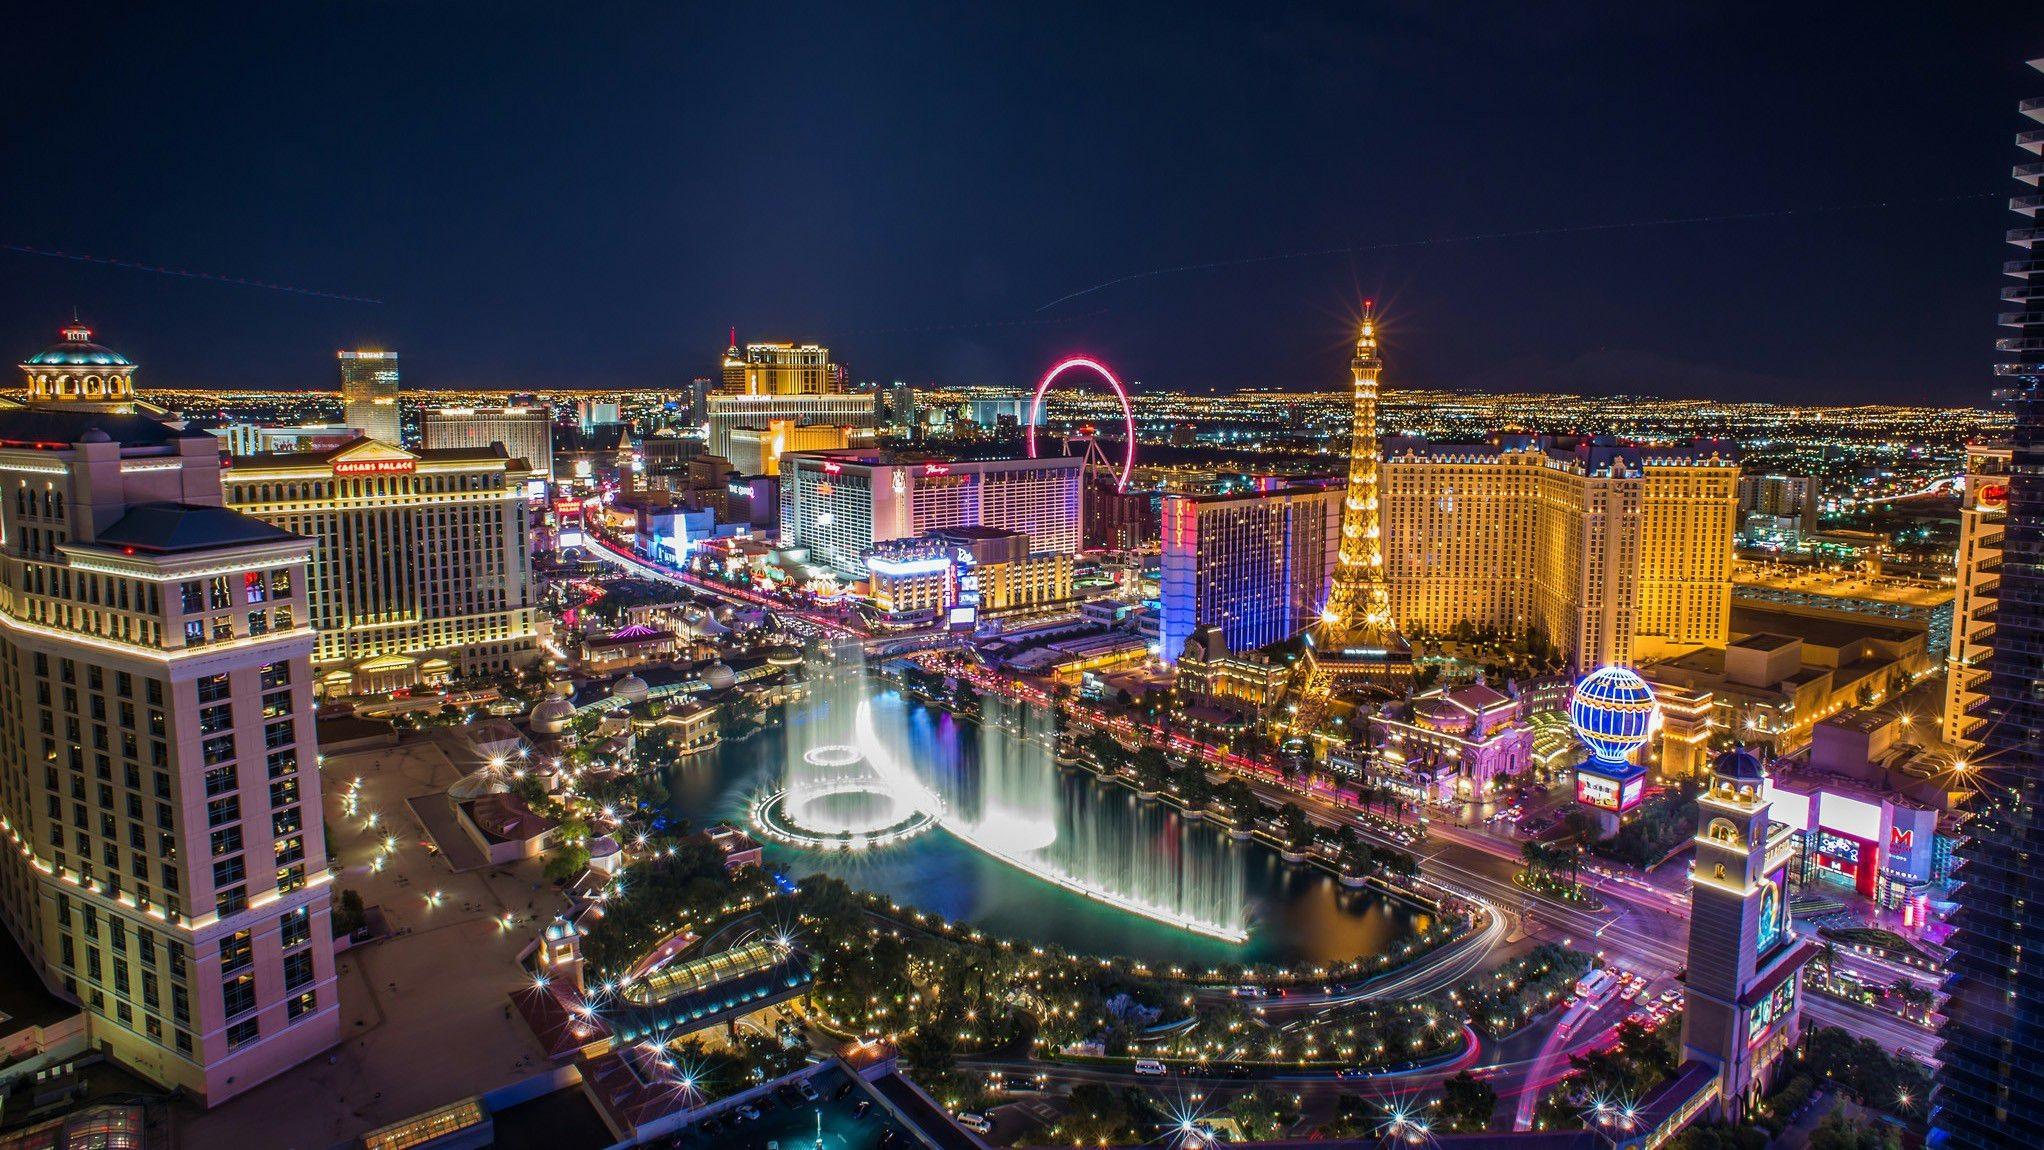 Las Vegas Hd Wallpaper 80 Pictures